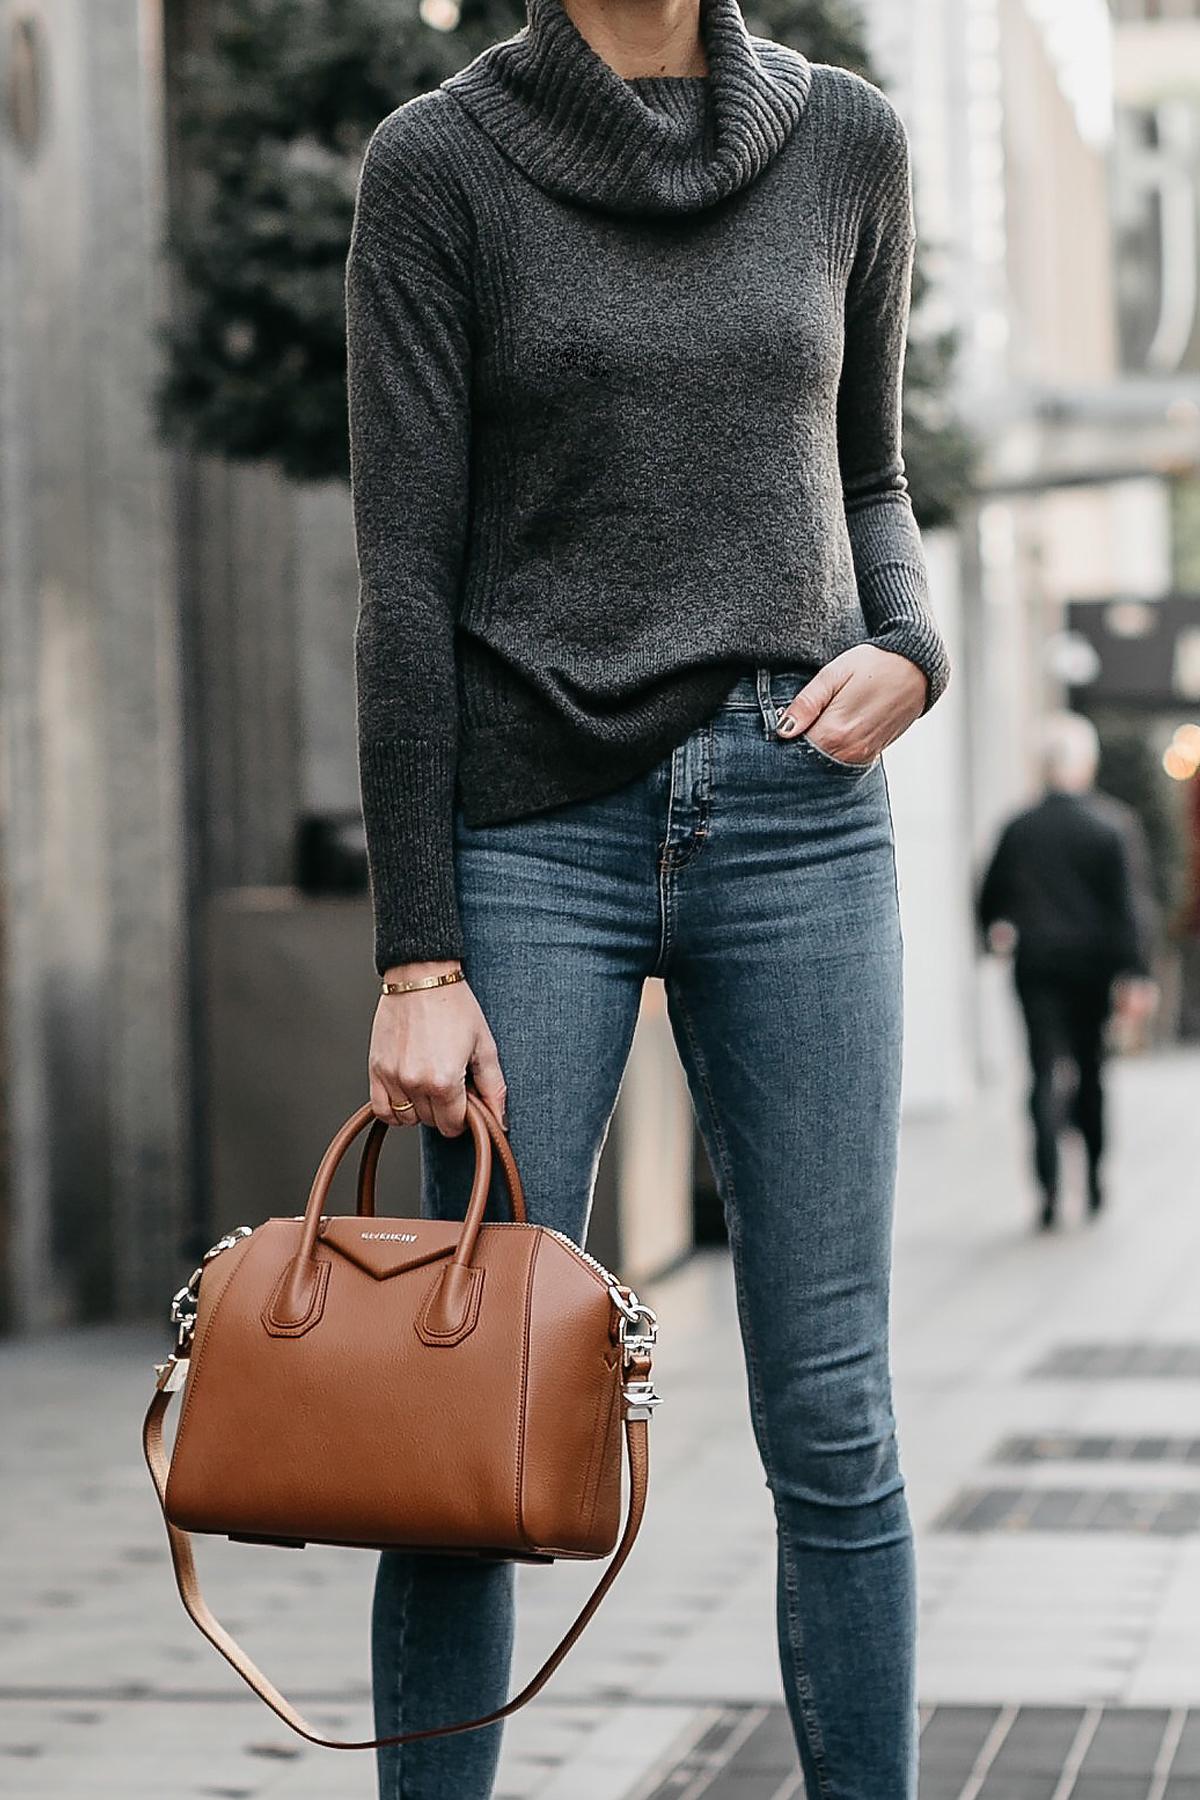 Grey Turtleneck Sweater Denim Skinny Jeans Givenchy Antigona Cognac Handbag Fashion Jackson Dallas Blogger Fashion Blogger Street Style